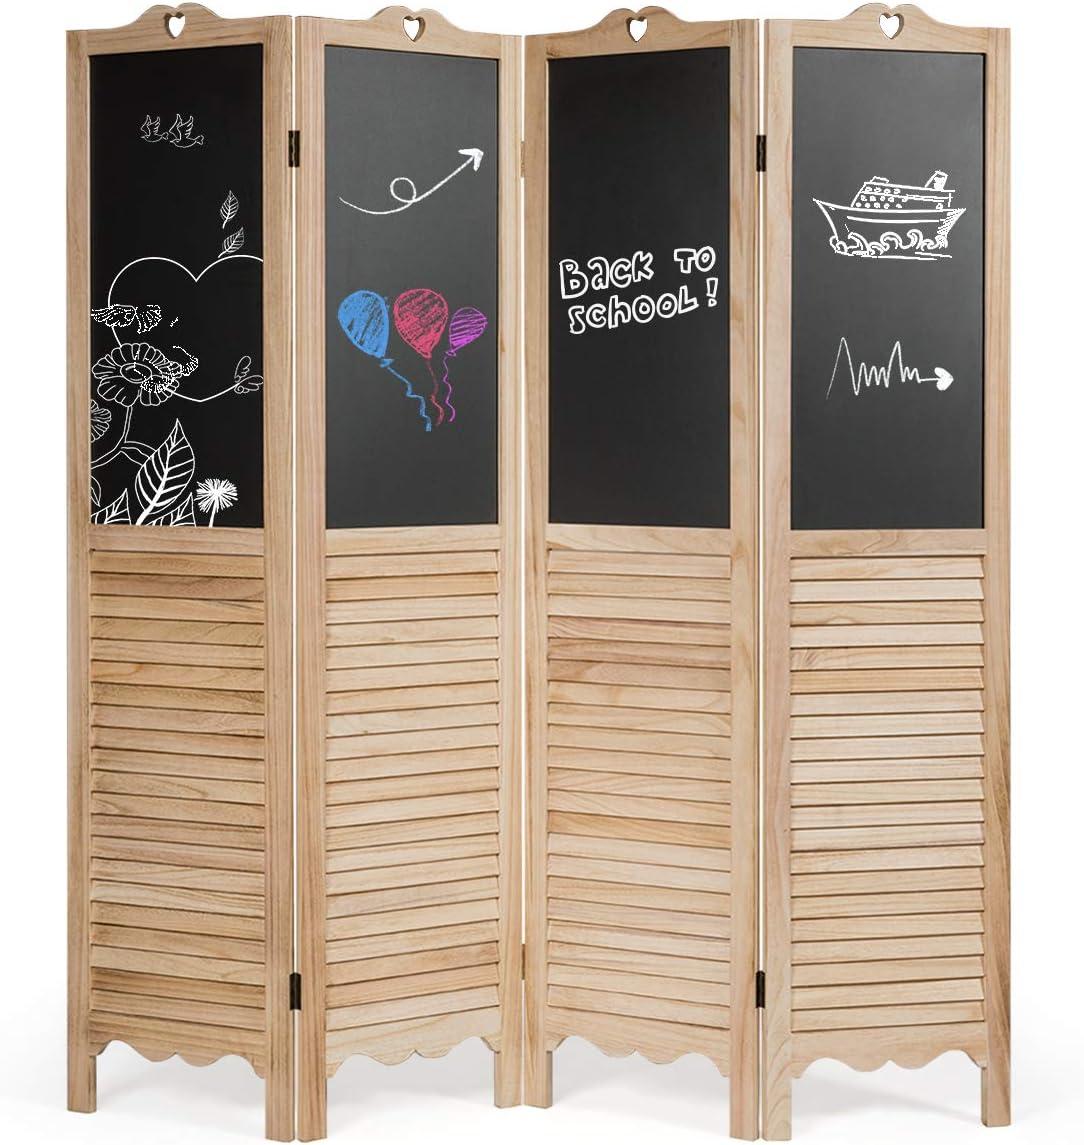 Giantex 5.7 Ft Folding Screen, 4 Panel Screen Room Divider w/Chalkboard Panels, Indoor Room Dividers for Bedroom, Living Room, Office, Restaurant (Natural)